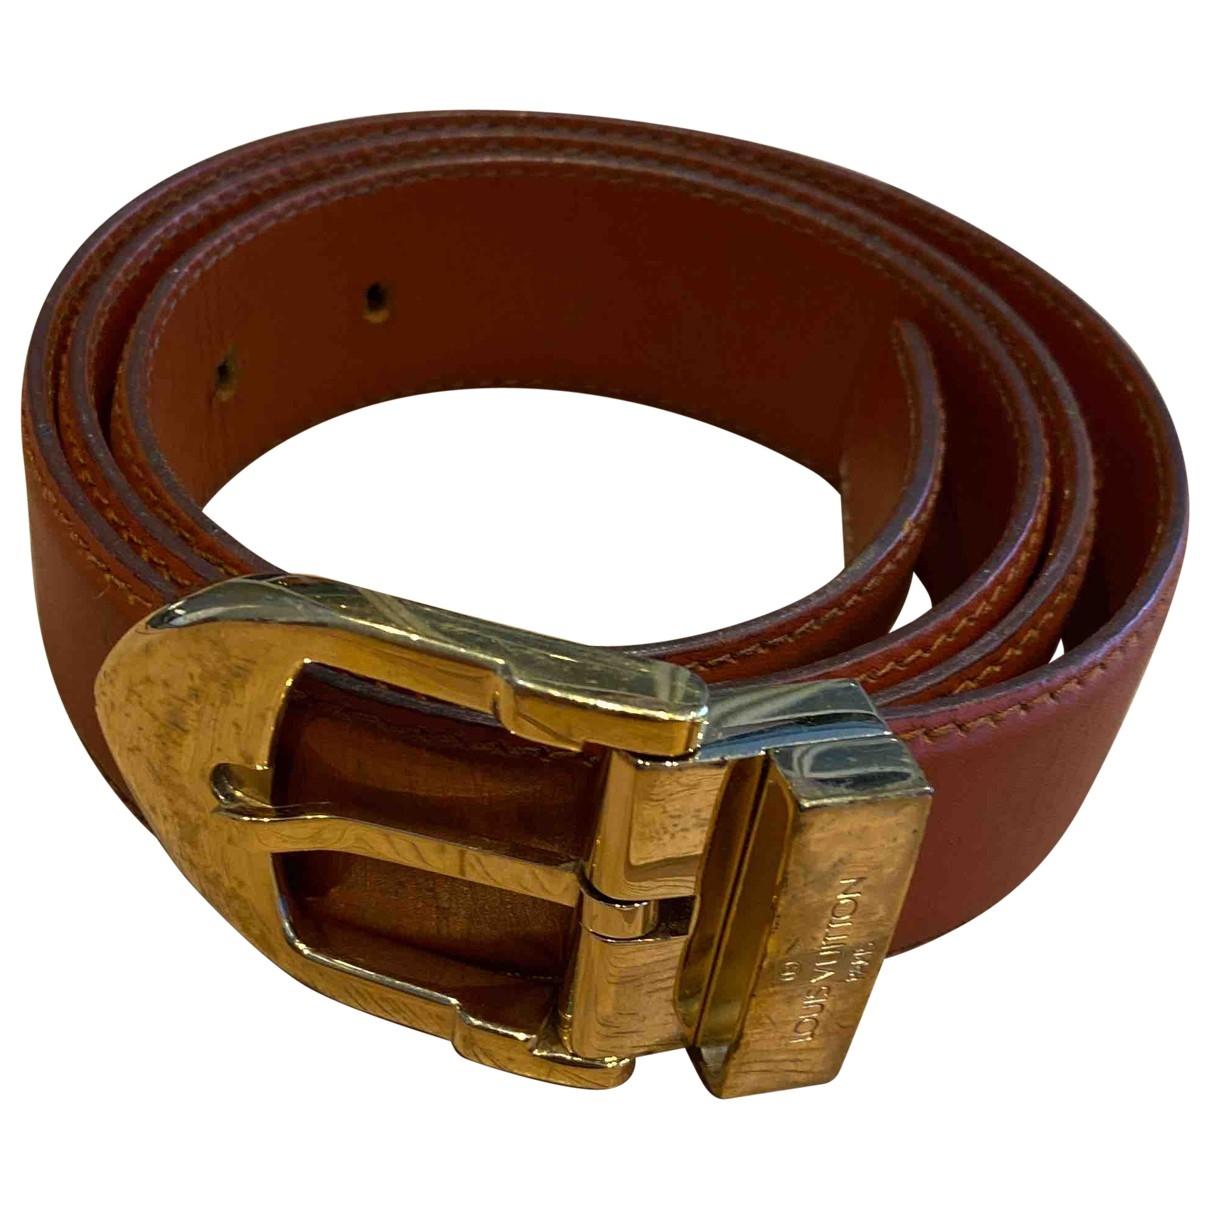 Louis Vuitton \N Brown Leather belt for Women 95 cm